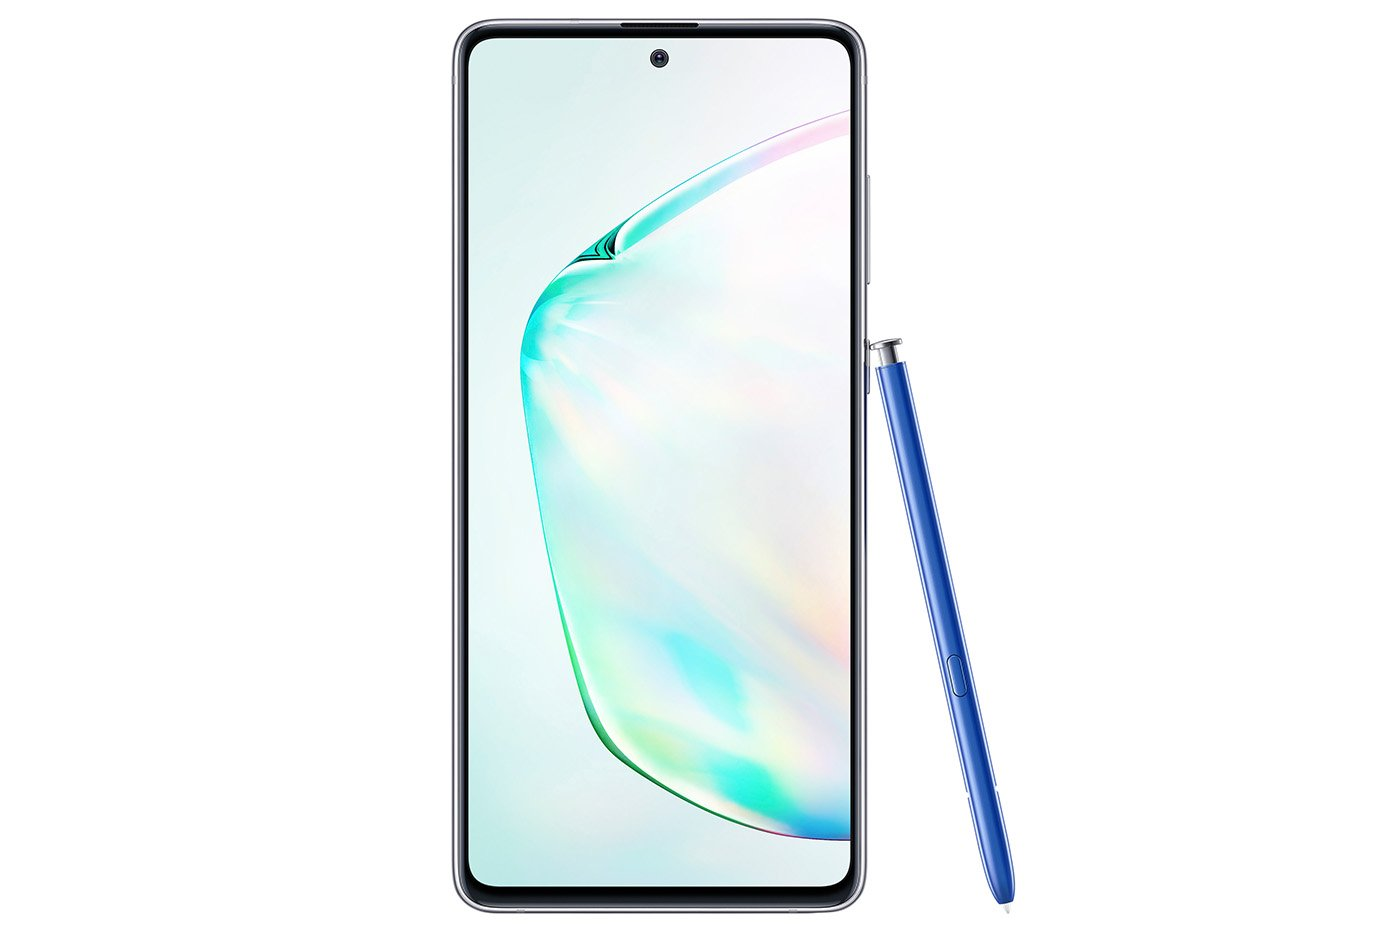 galaxy note 10 - Samsung présente son Galaxy Note 10 Lite